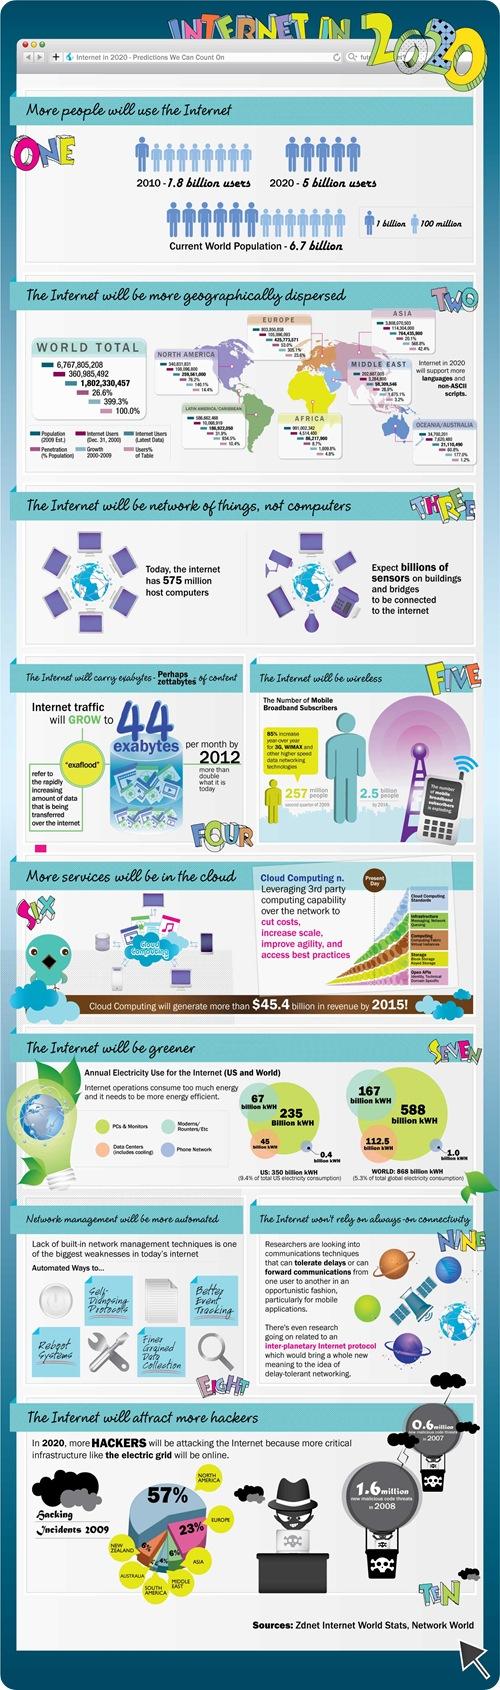 internet en 2020 infographie - Internet en 2020 [Infographie]